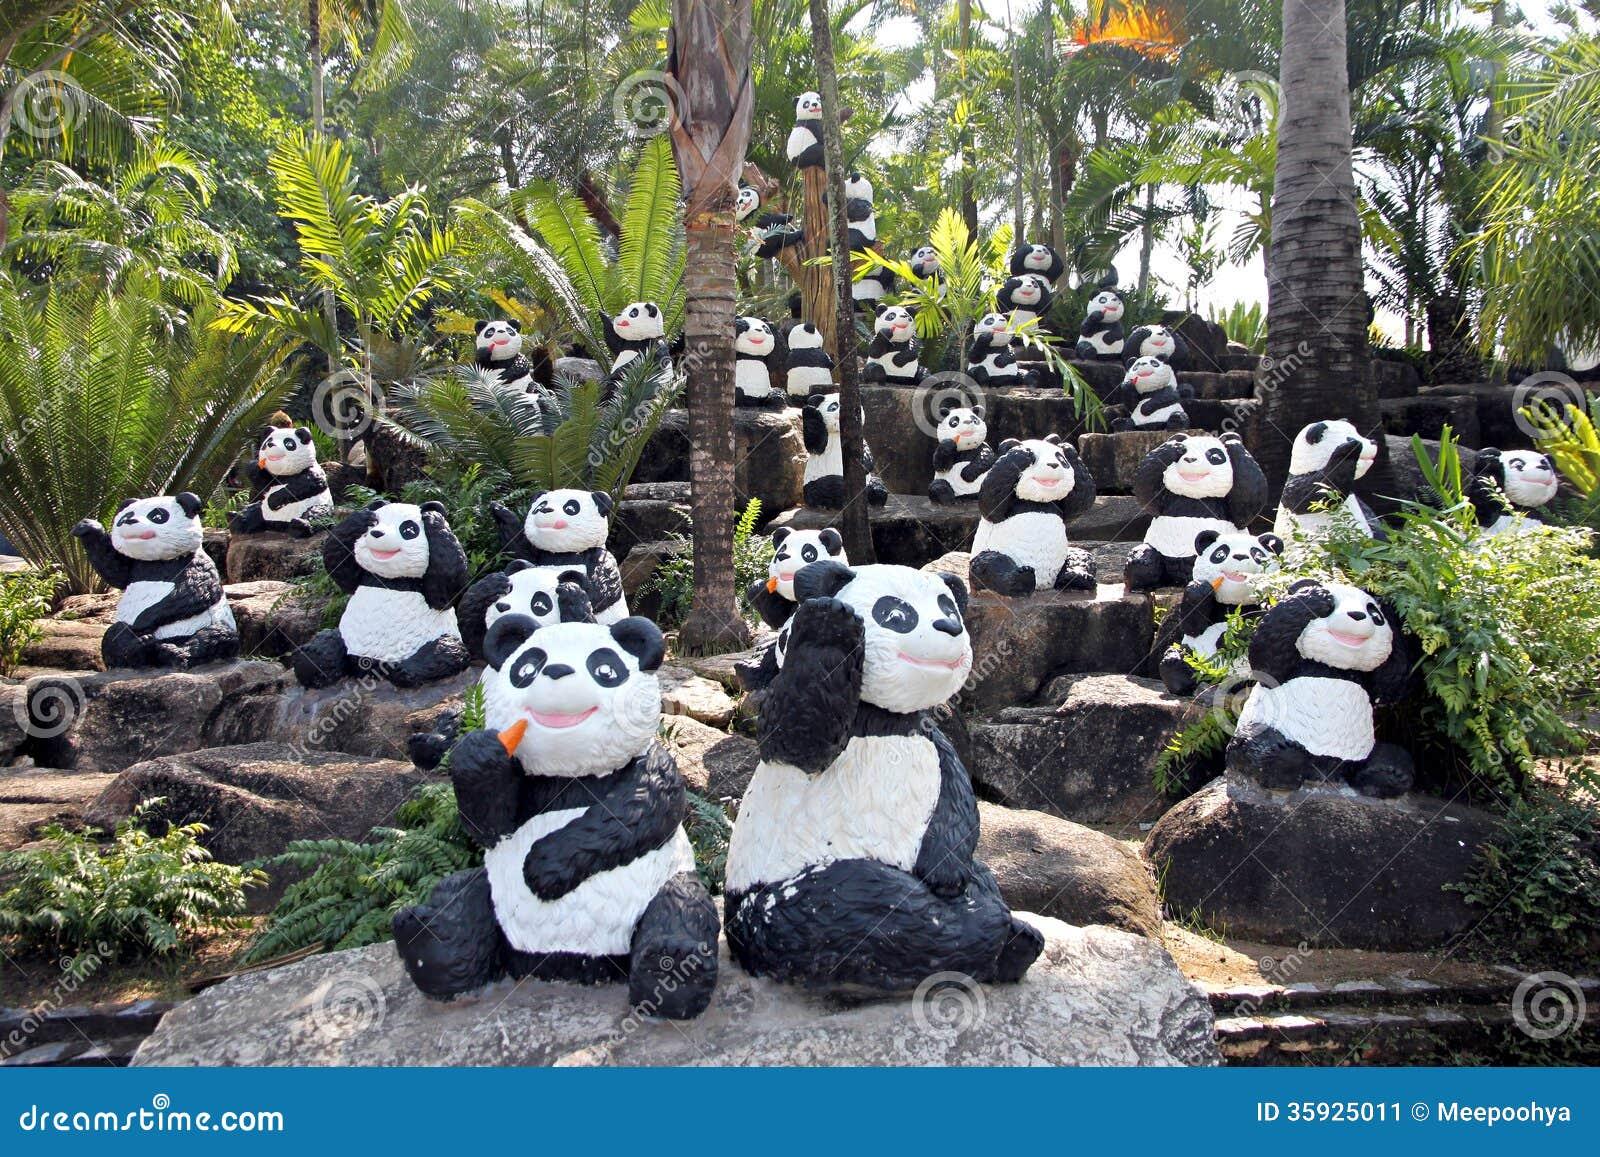 Panda Statue.